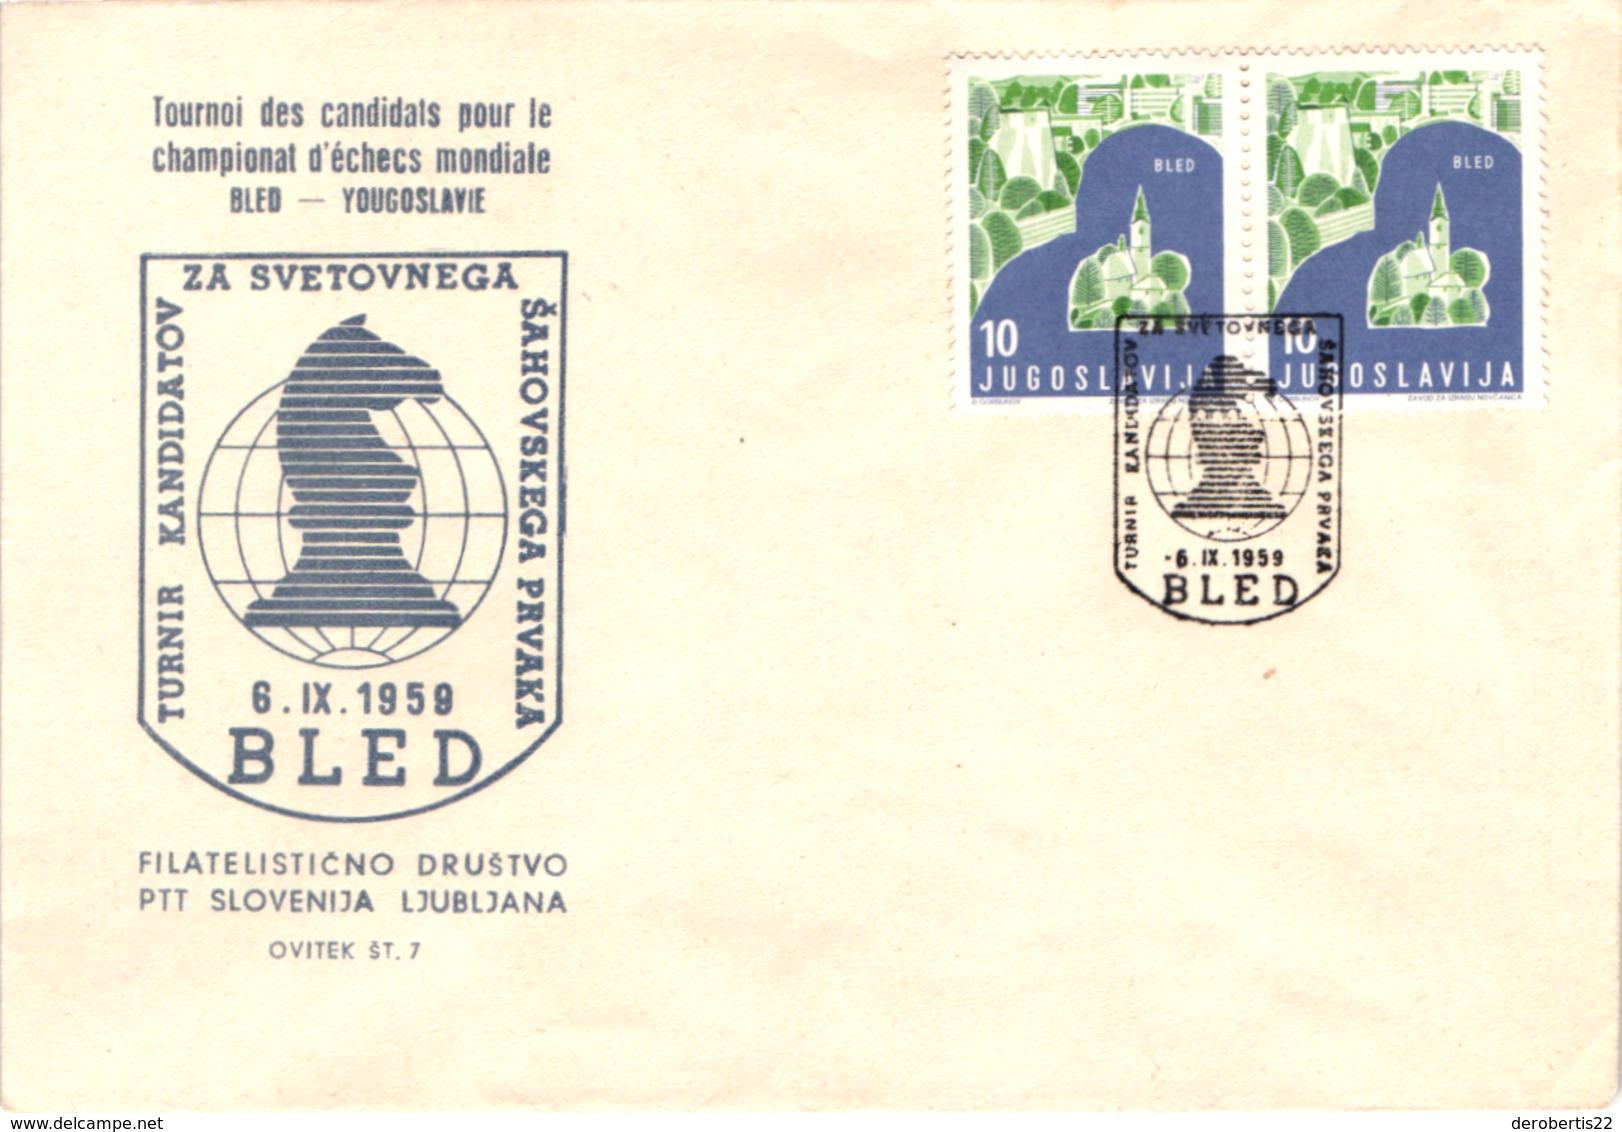 Chess Schach Echecs Ajedrez - Yugoslavia. Bled 1959 Candidates Tournament - Souvenir Cover CKM 68a - Scacchi